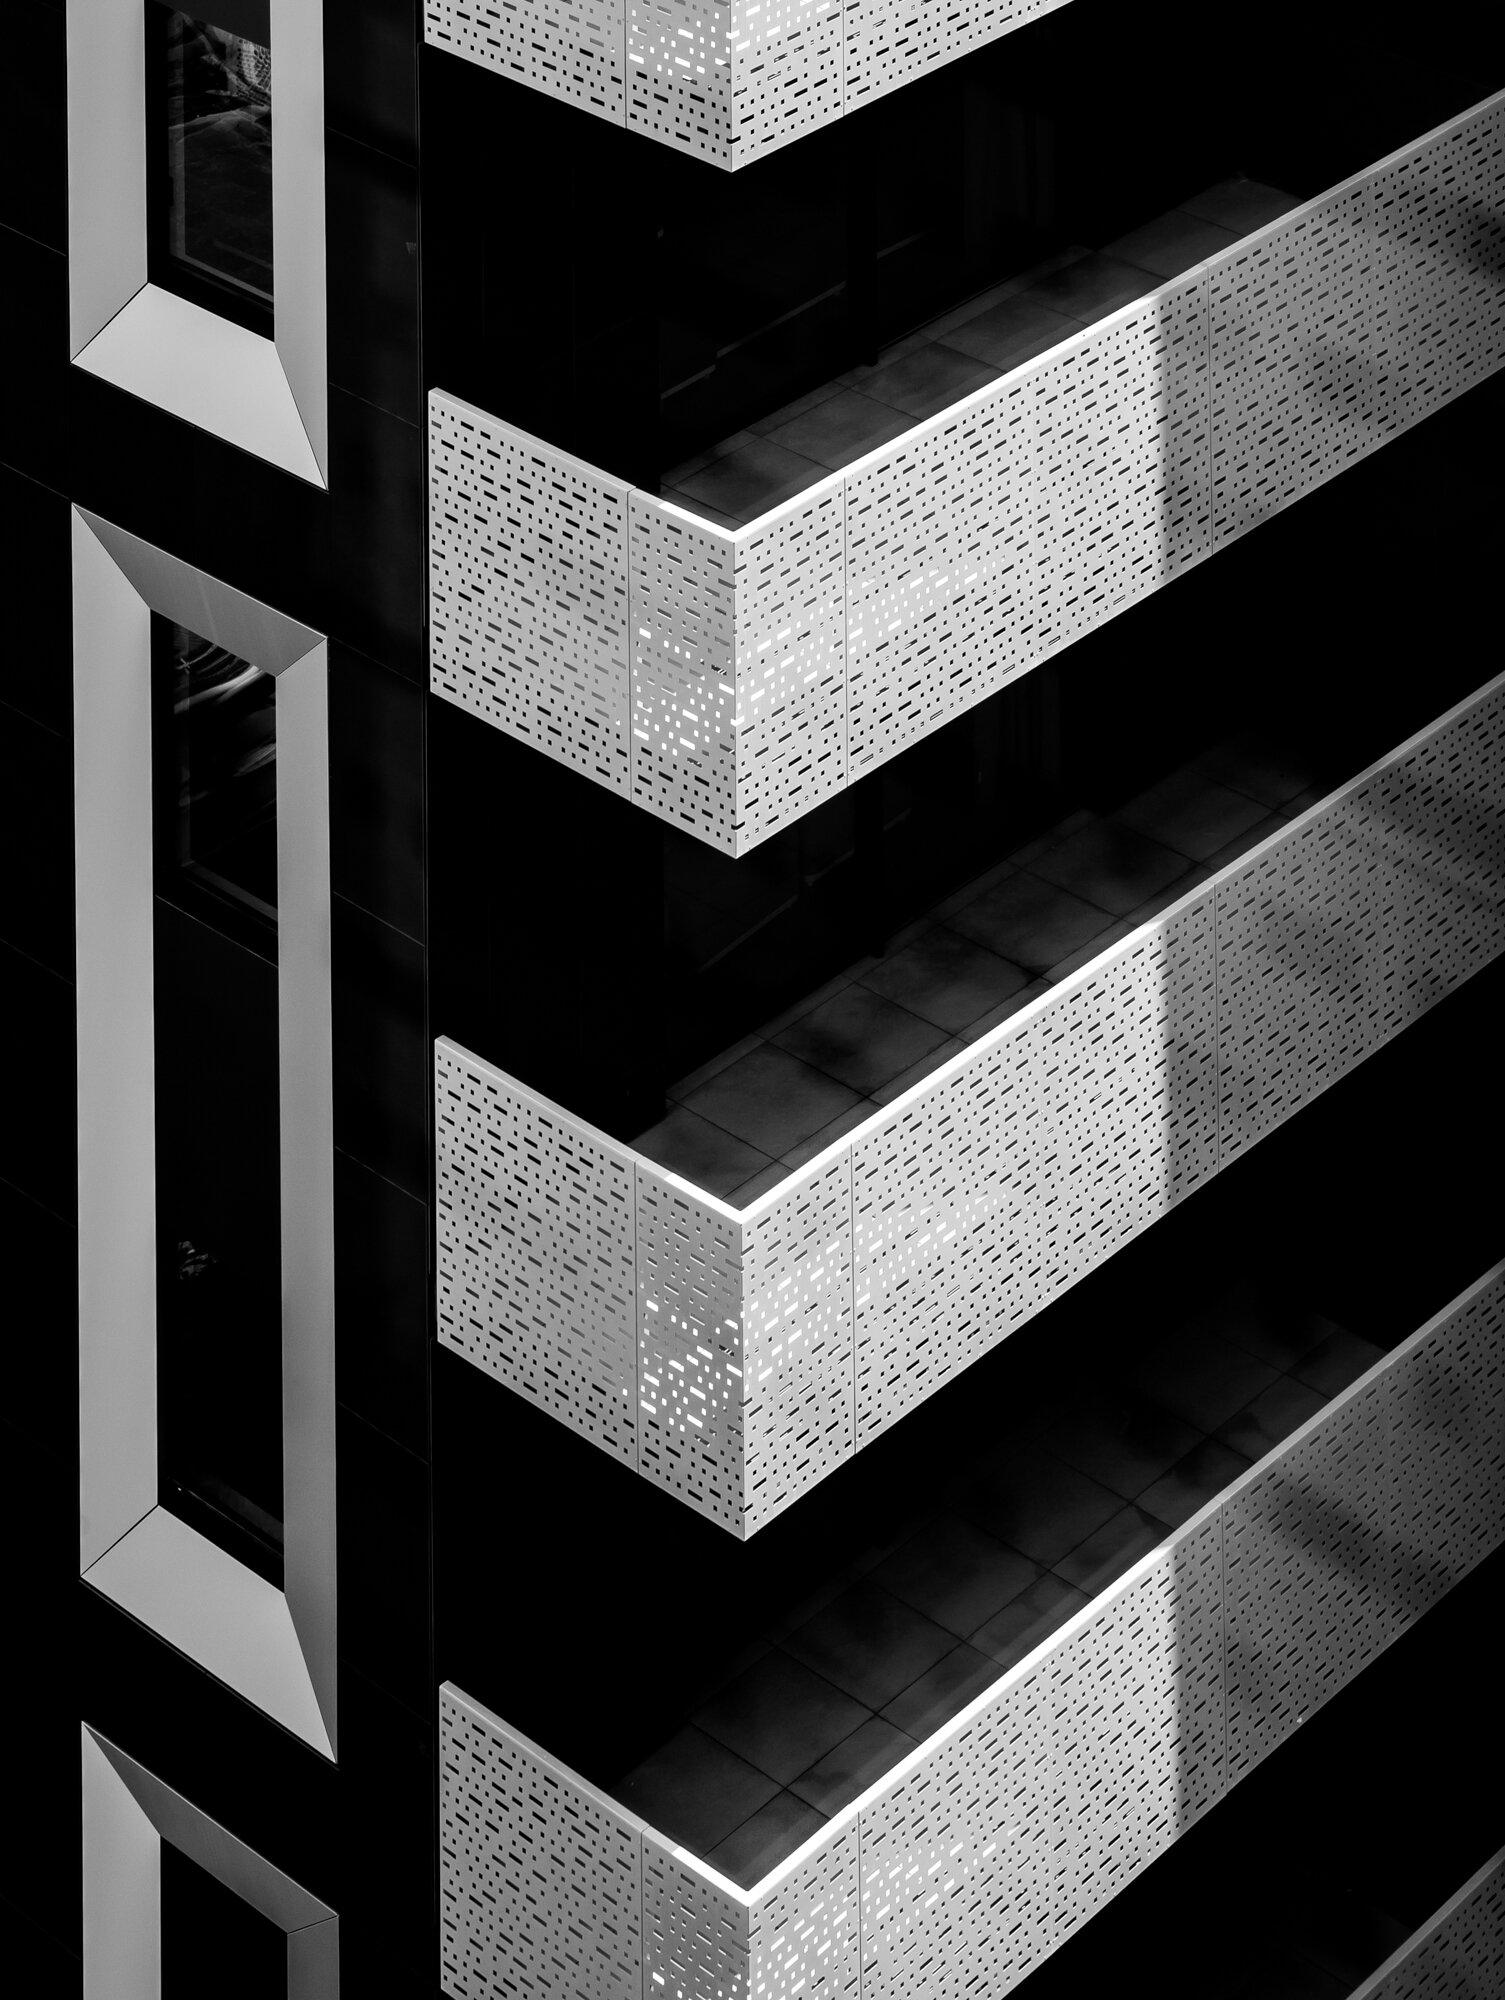 Cutwork_details-5.jpg